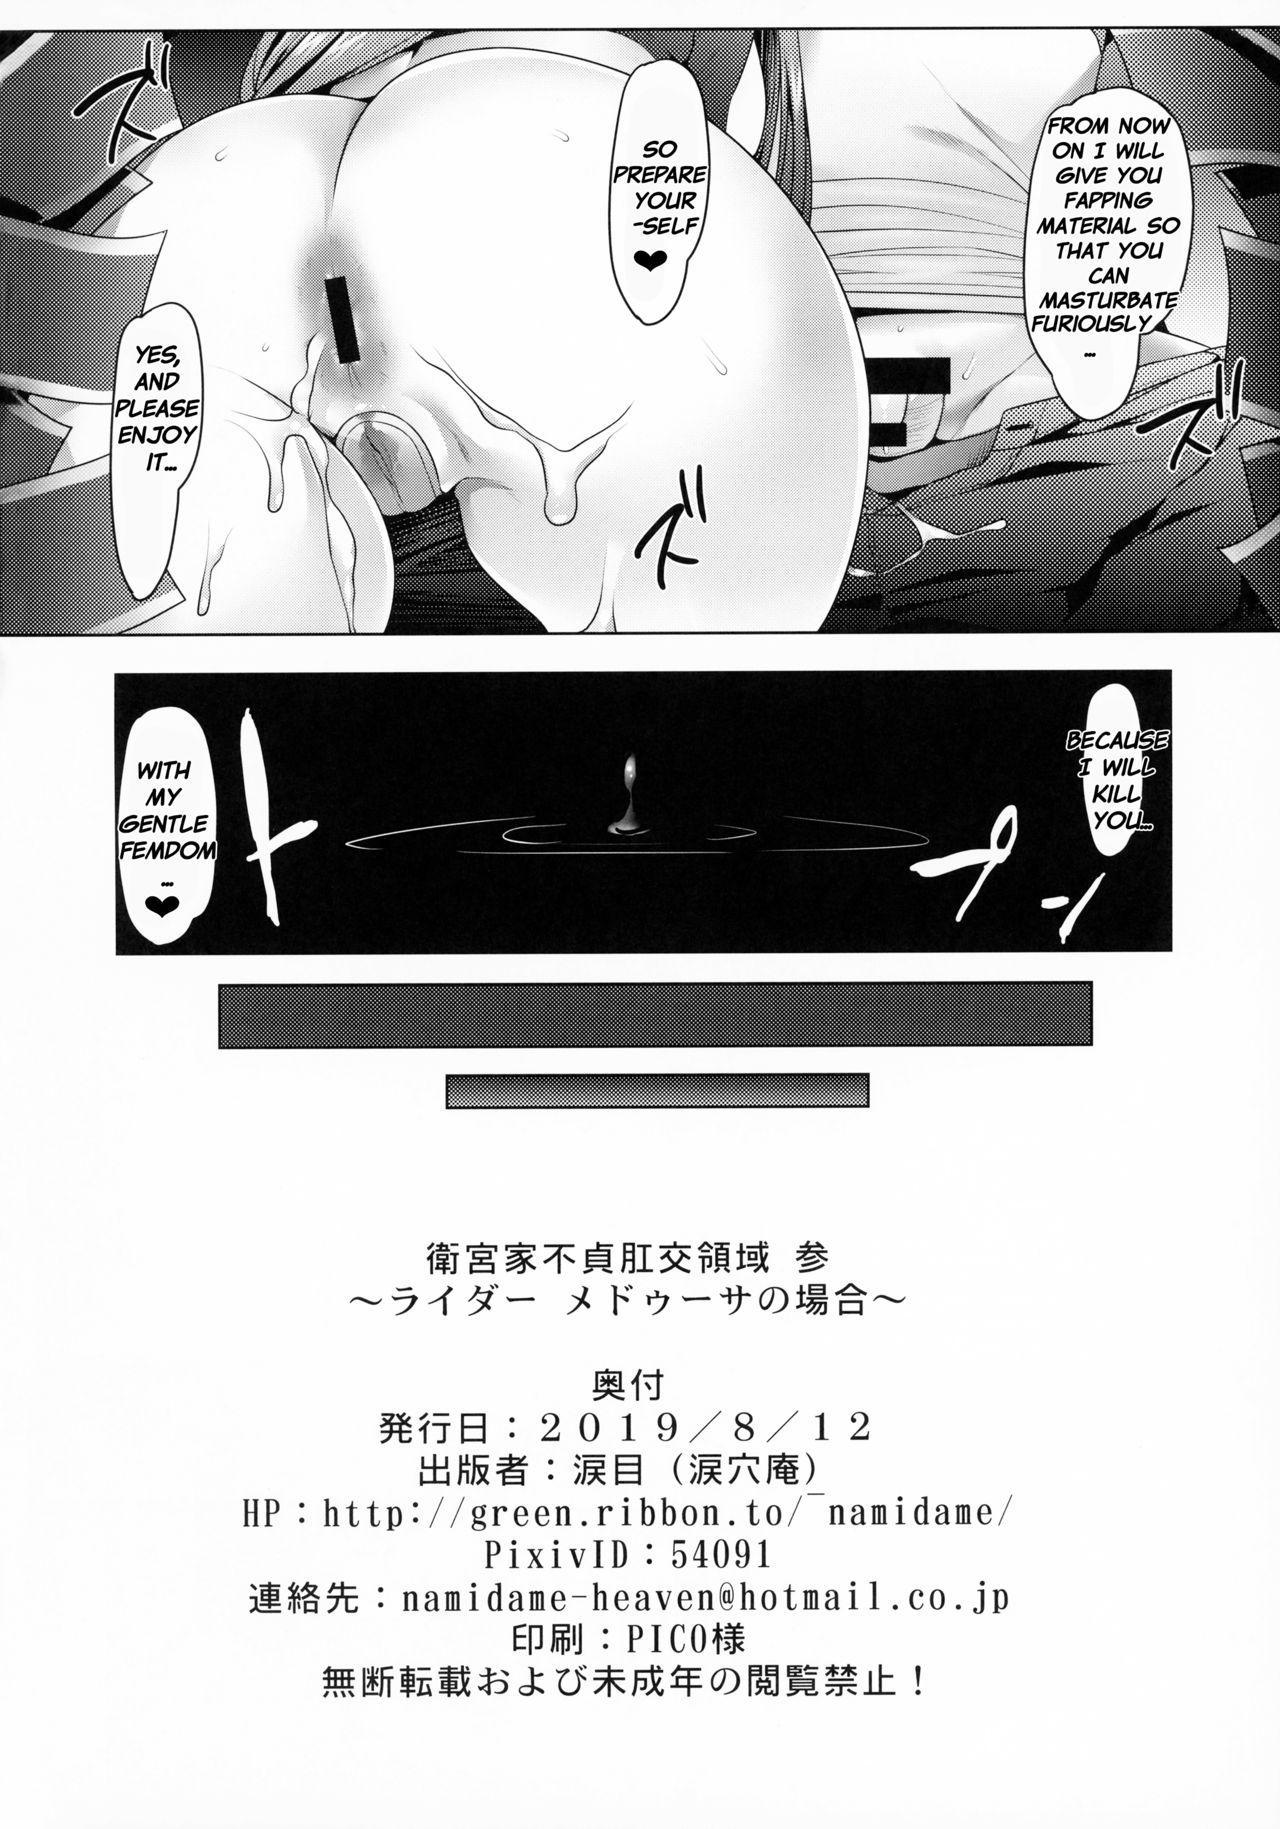 (C96) [Ruiketsuan (Namidame)] Emiya-ke Futei Koukou Ryouiki San ~Rider Medusa no Baai~ Anal cuckolding for Emiya family 3 ~ Rider Medusa case (Fate/stay night) [English] [Netorare Nation] 18